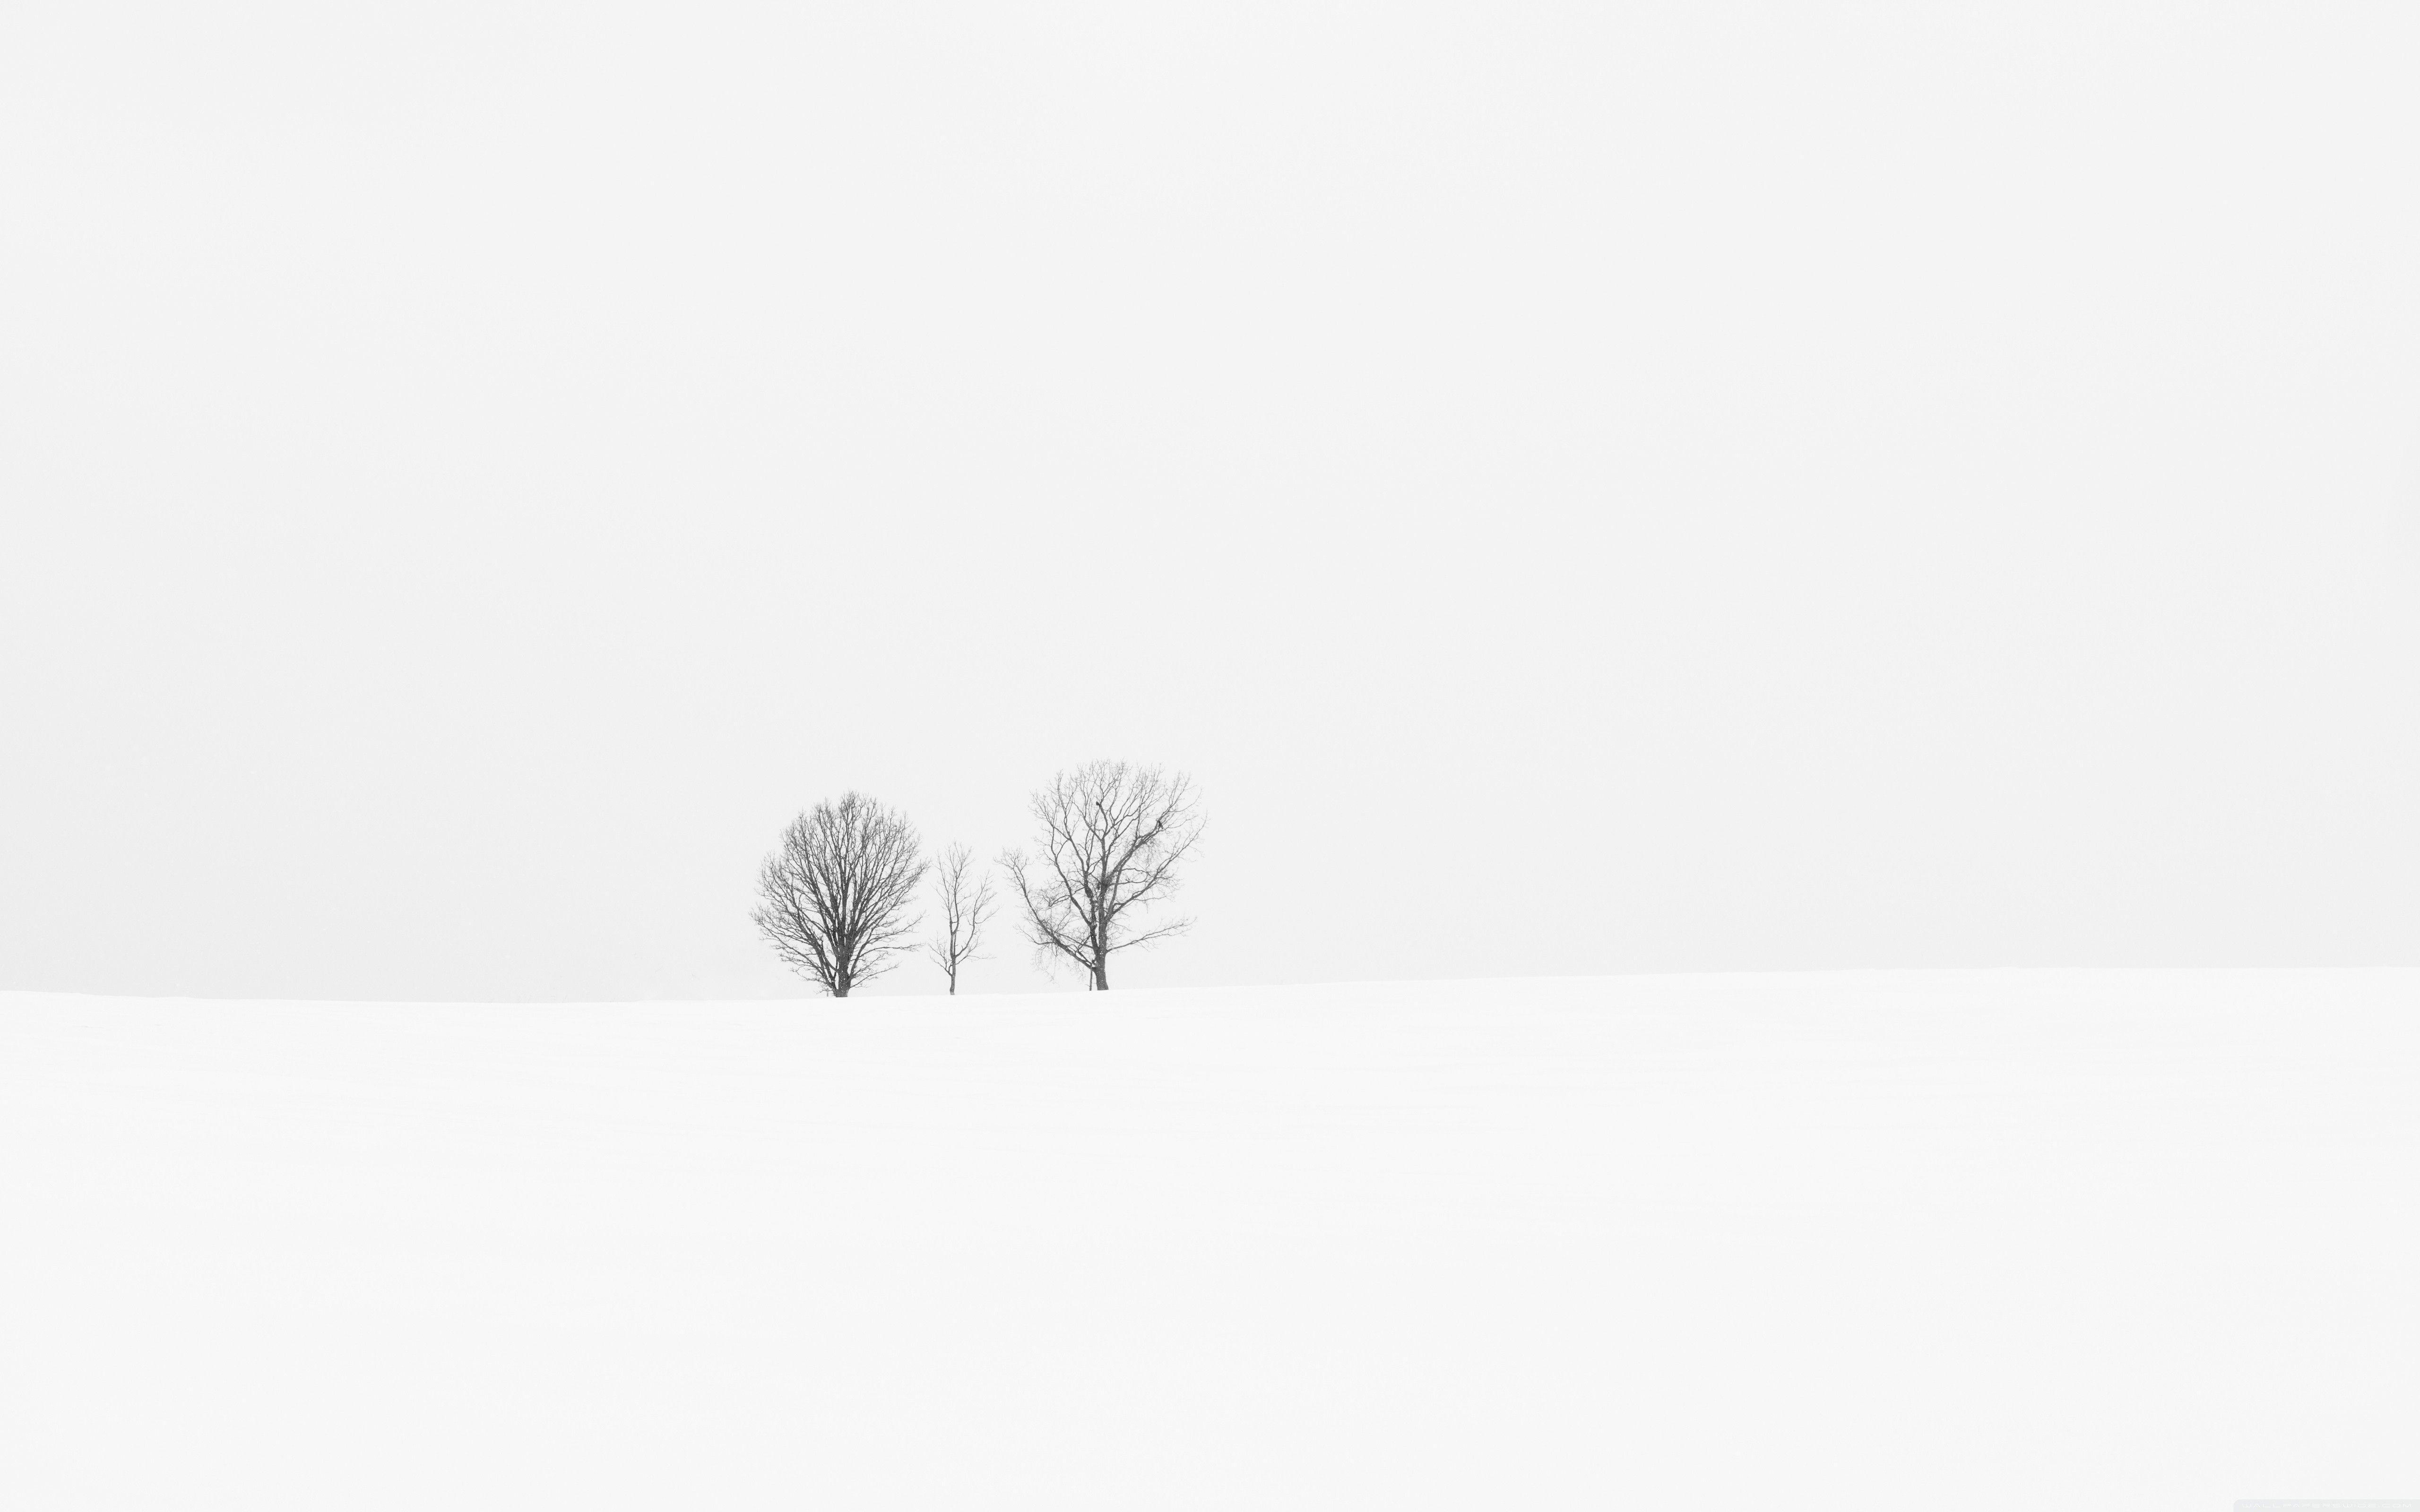 White Minimalist Wallpapers Top Free White Minimalist